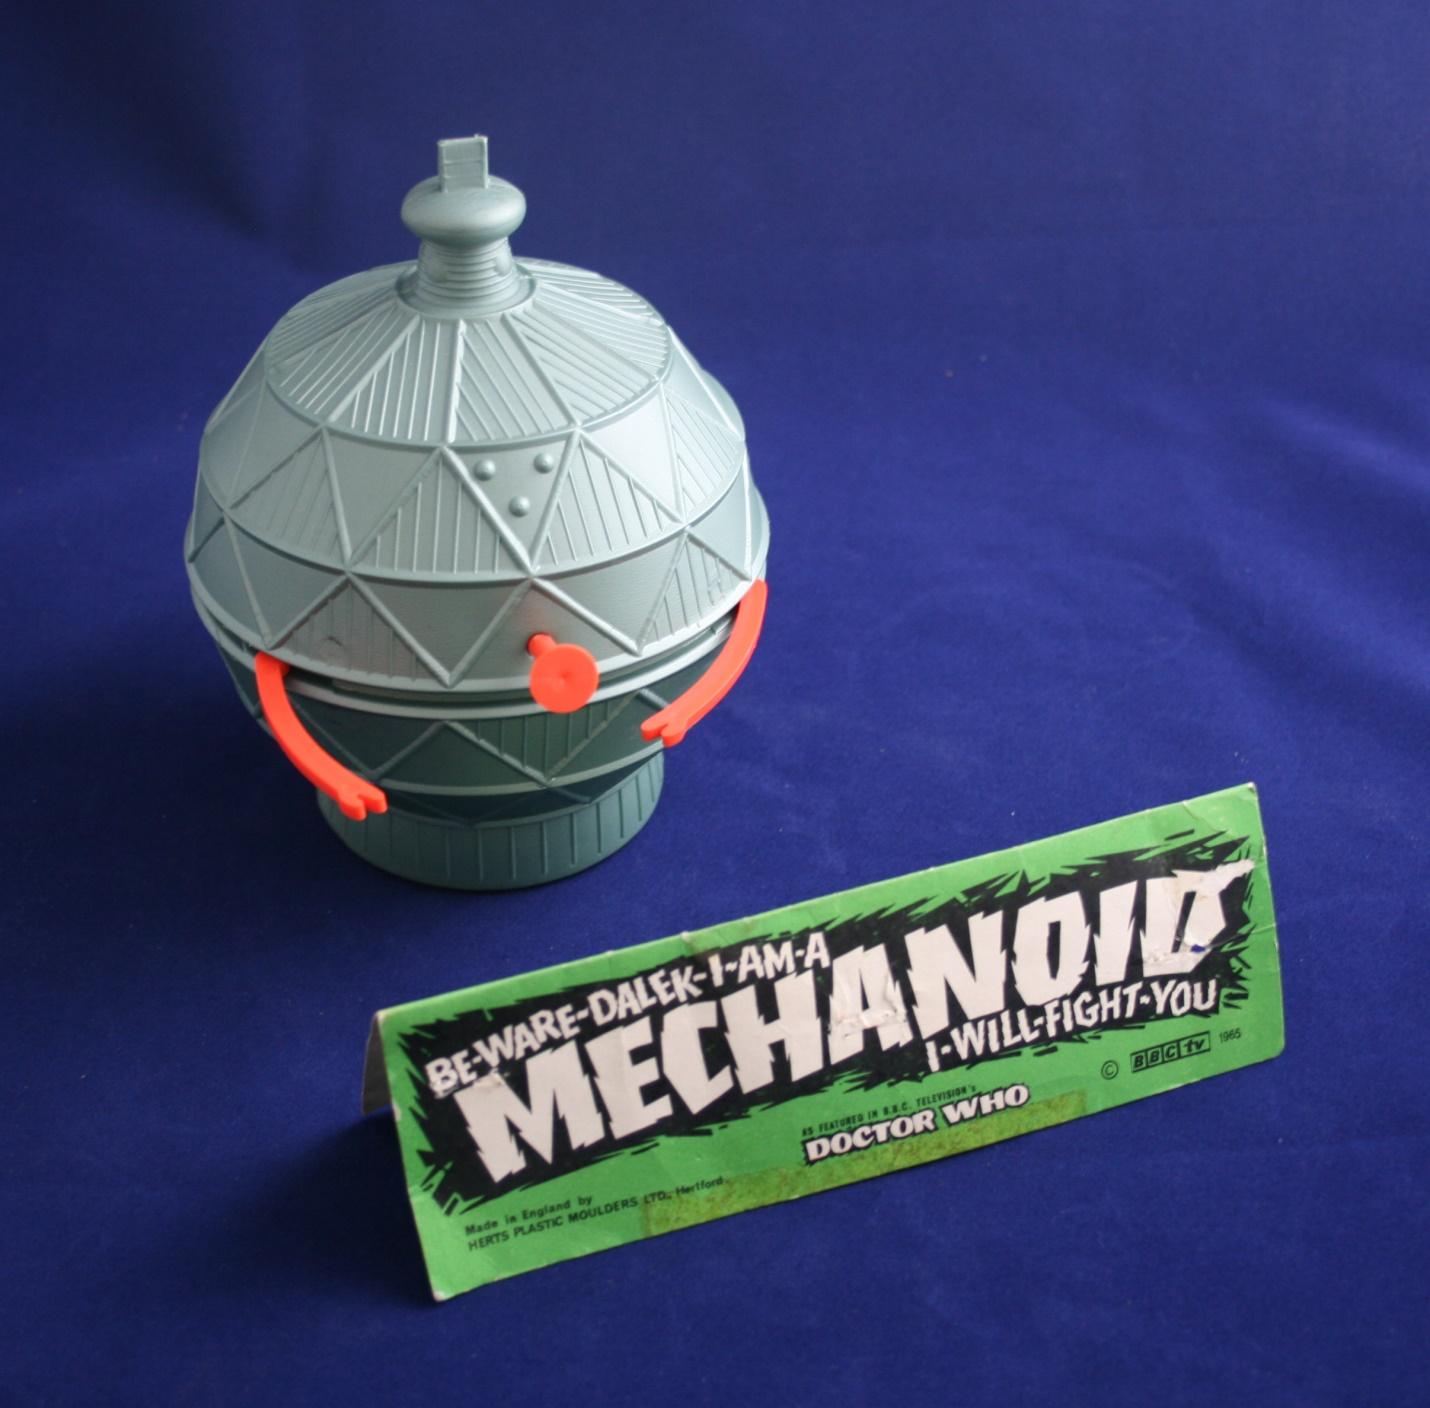 Herts Plastic Moulders Ltd., Mechanoid